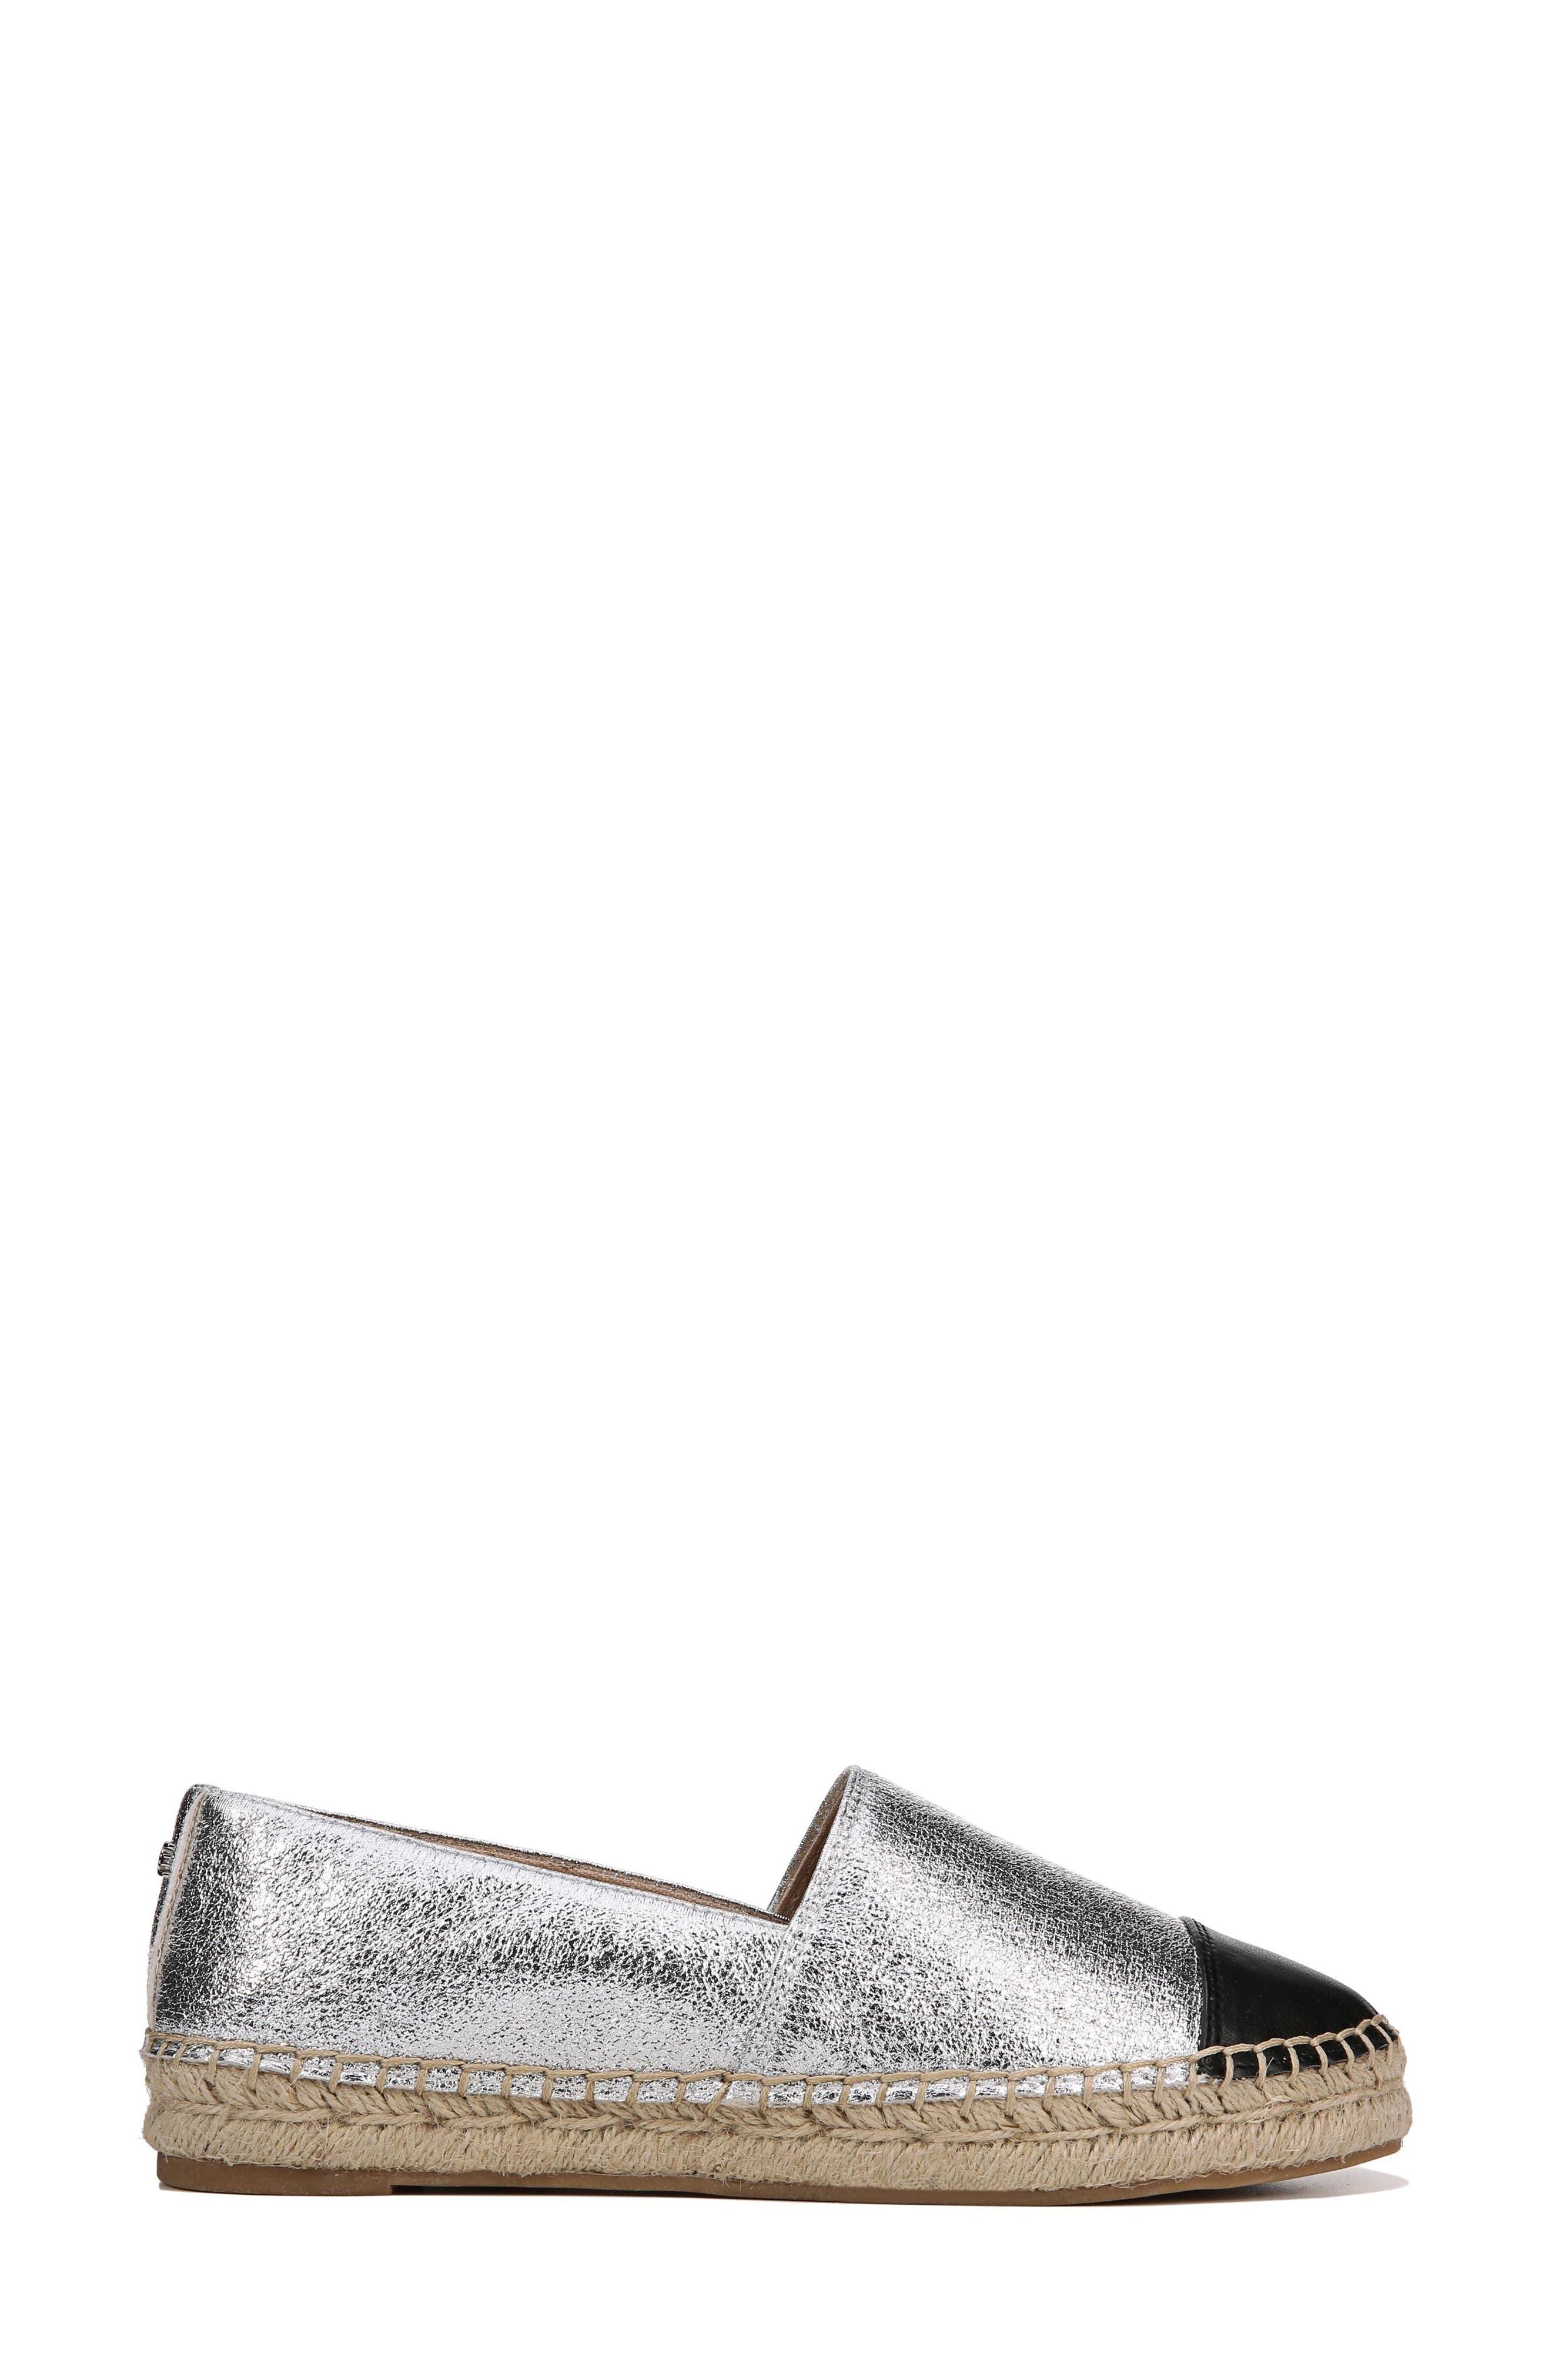 Krissy Espadrille Flat,                             Alternate thumbnail 3, color,                             Soft Silver Fabric